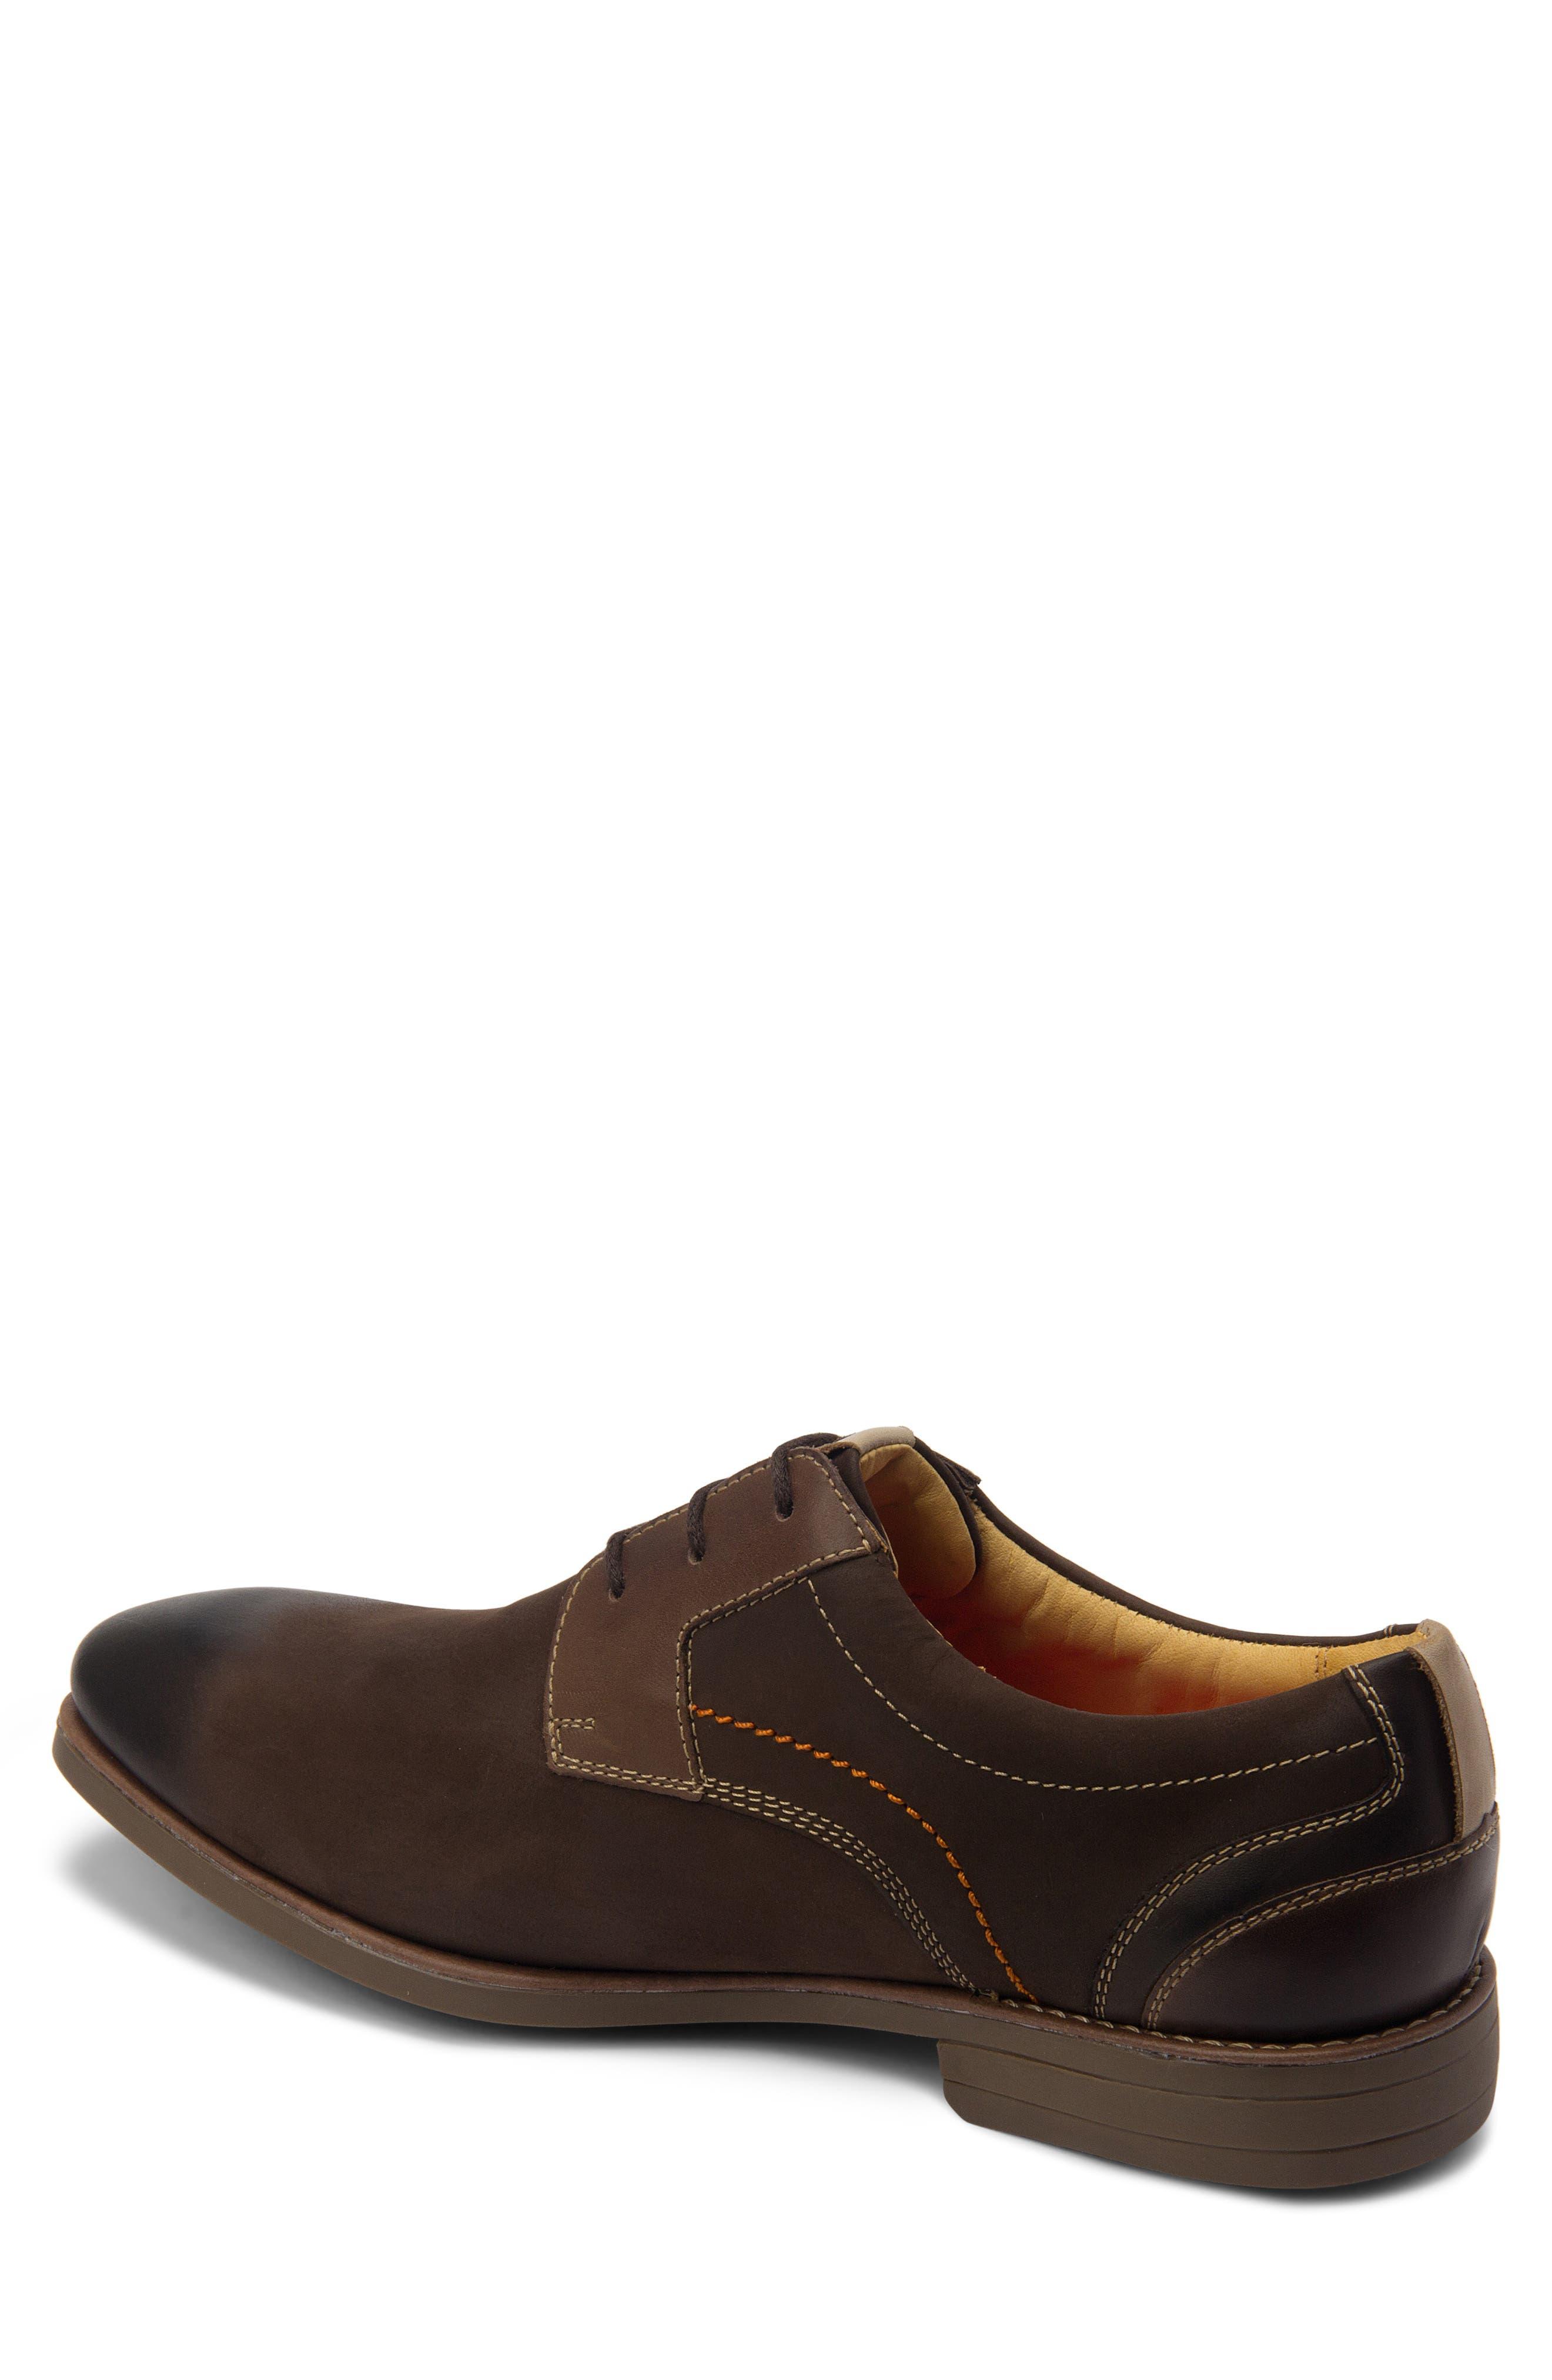 SANDRO MOSCOLONI, Mantel Plain Toe Derby, Alternate thumbnail 2, color, BROWN LEATHER